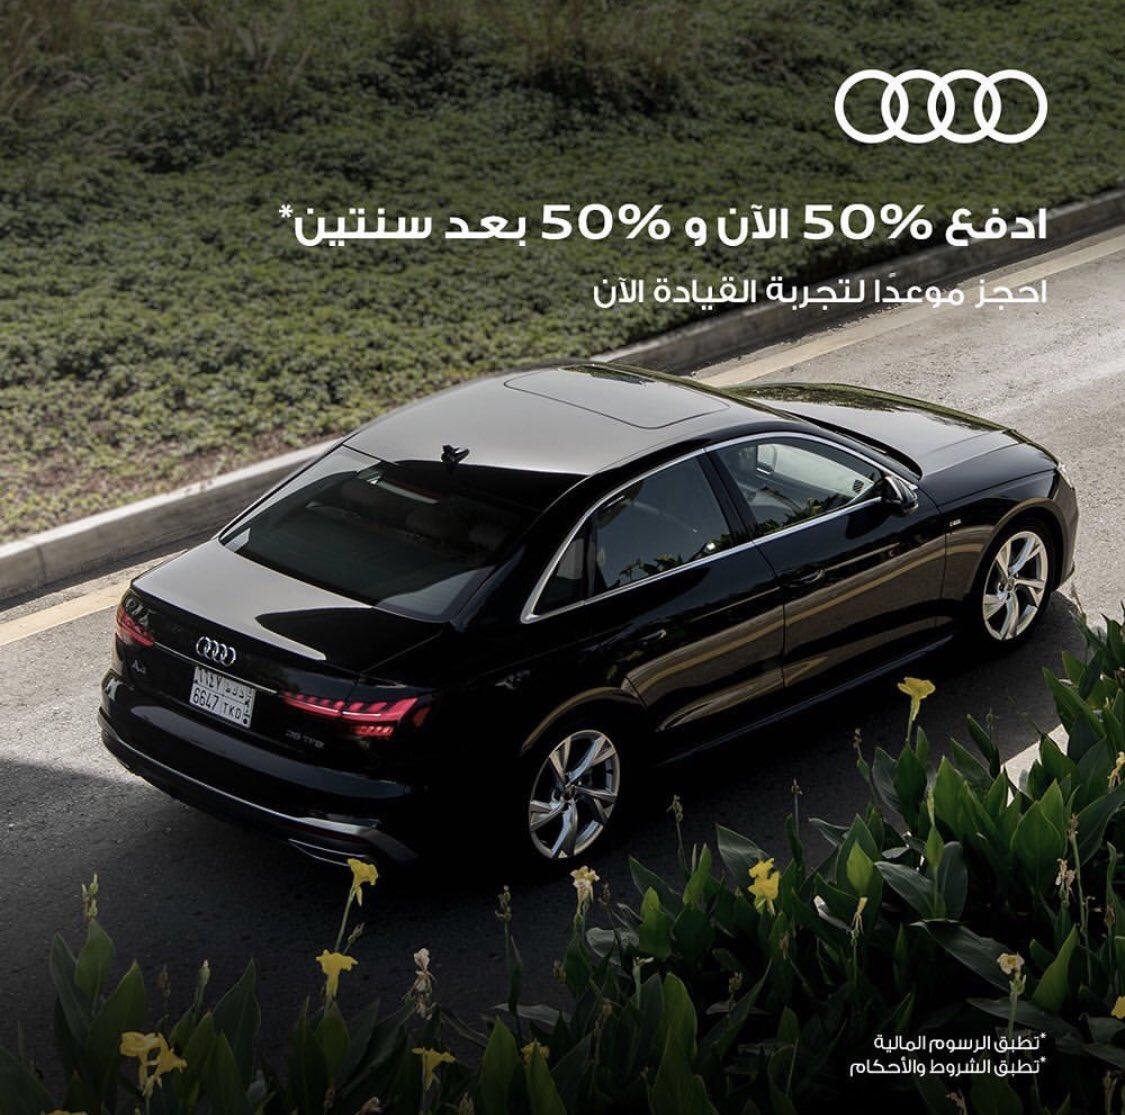 #عروض #سيارات #اودي #السعودية  #audi #cars #offers #ksa